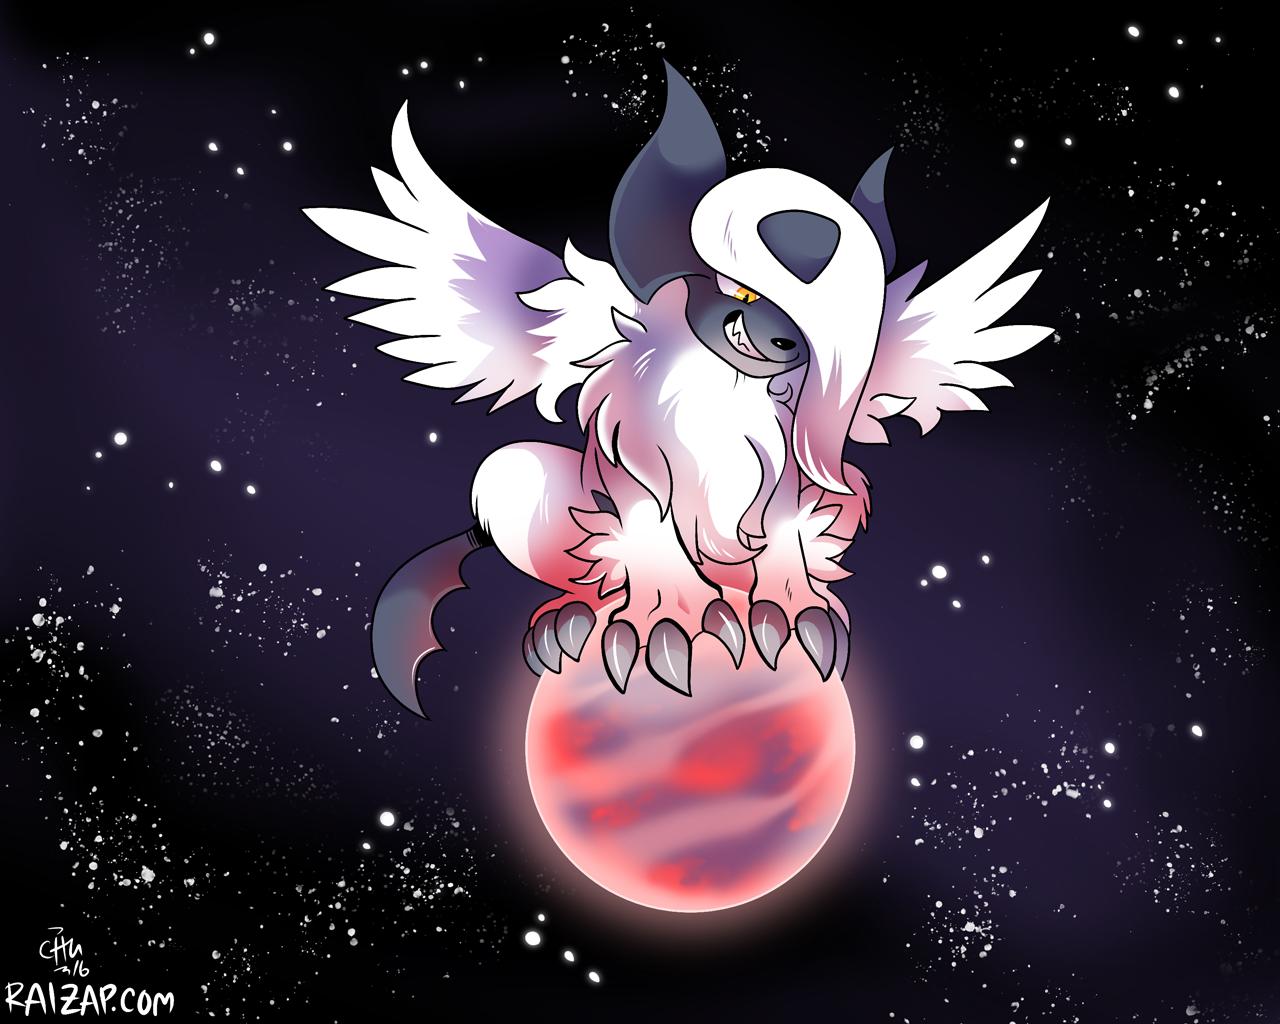 Planet sized mega absol by raizy on deviantart - Pokemon mega absol ...